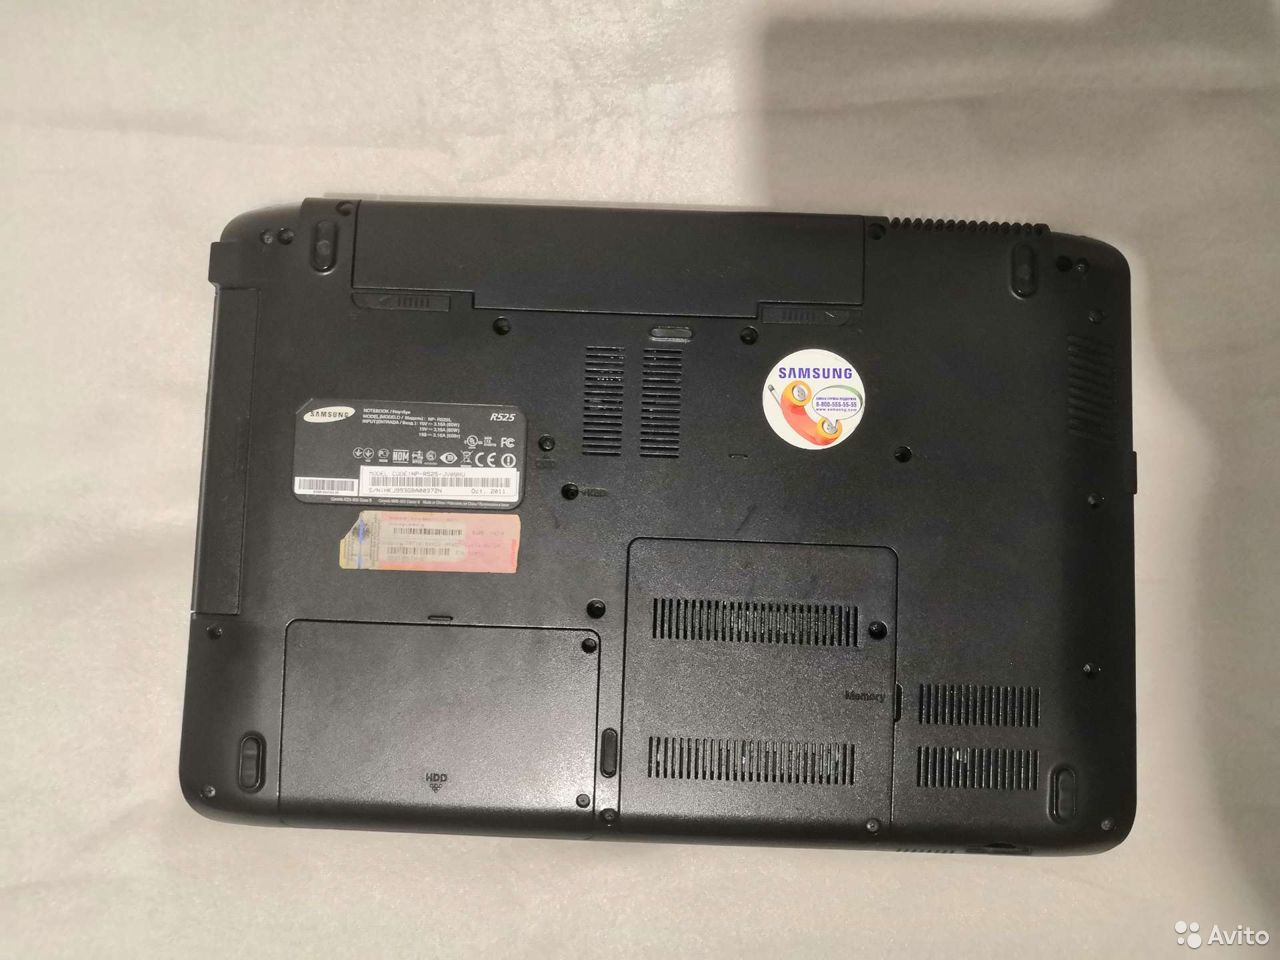 Samsung 15.6/Core i3/4gb/320gb  89889642251 купить 7